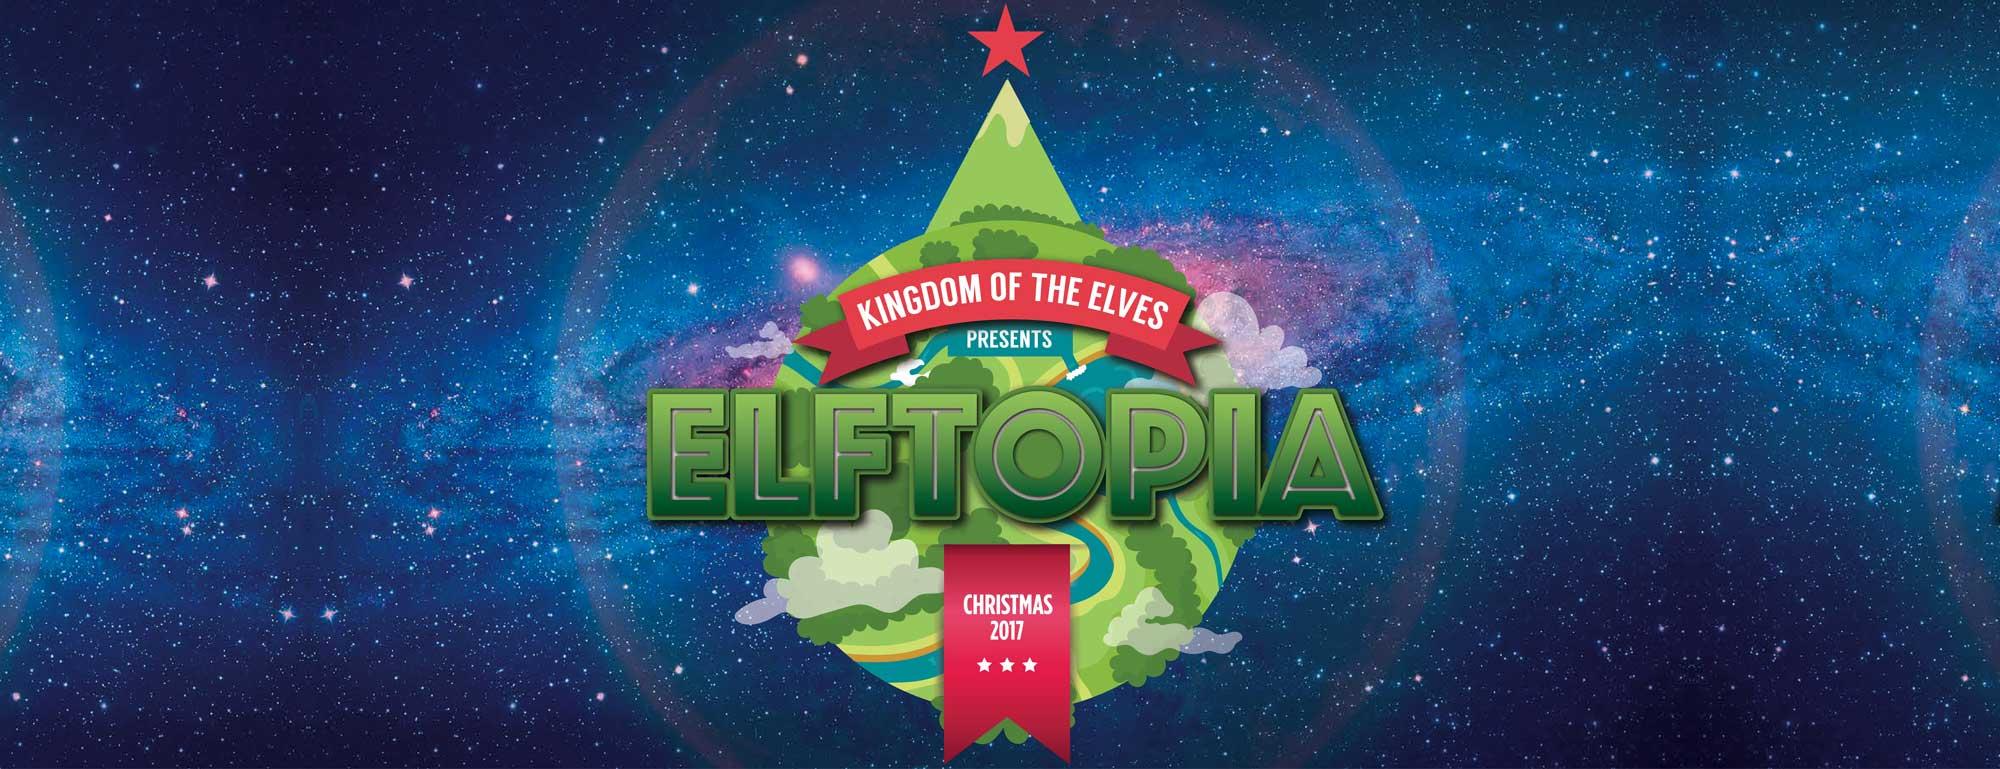 Kingdom of the elves